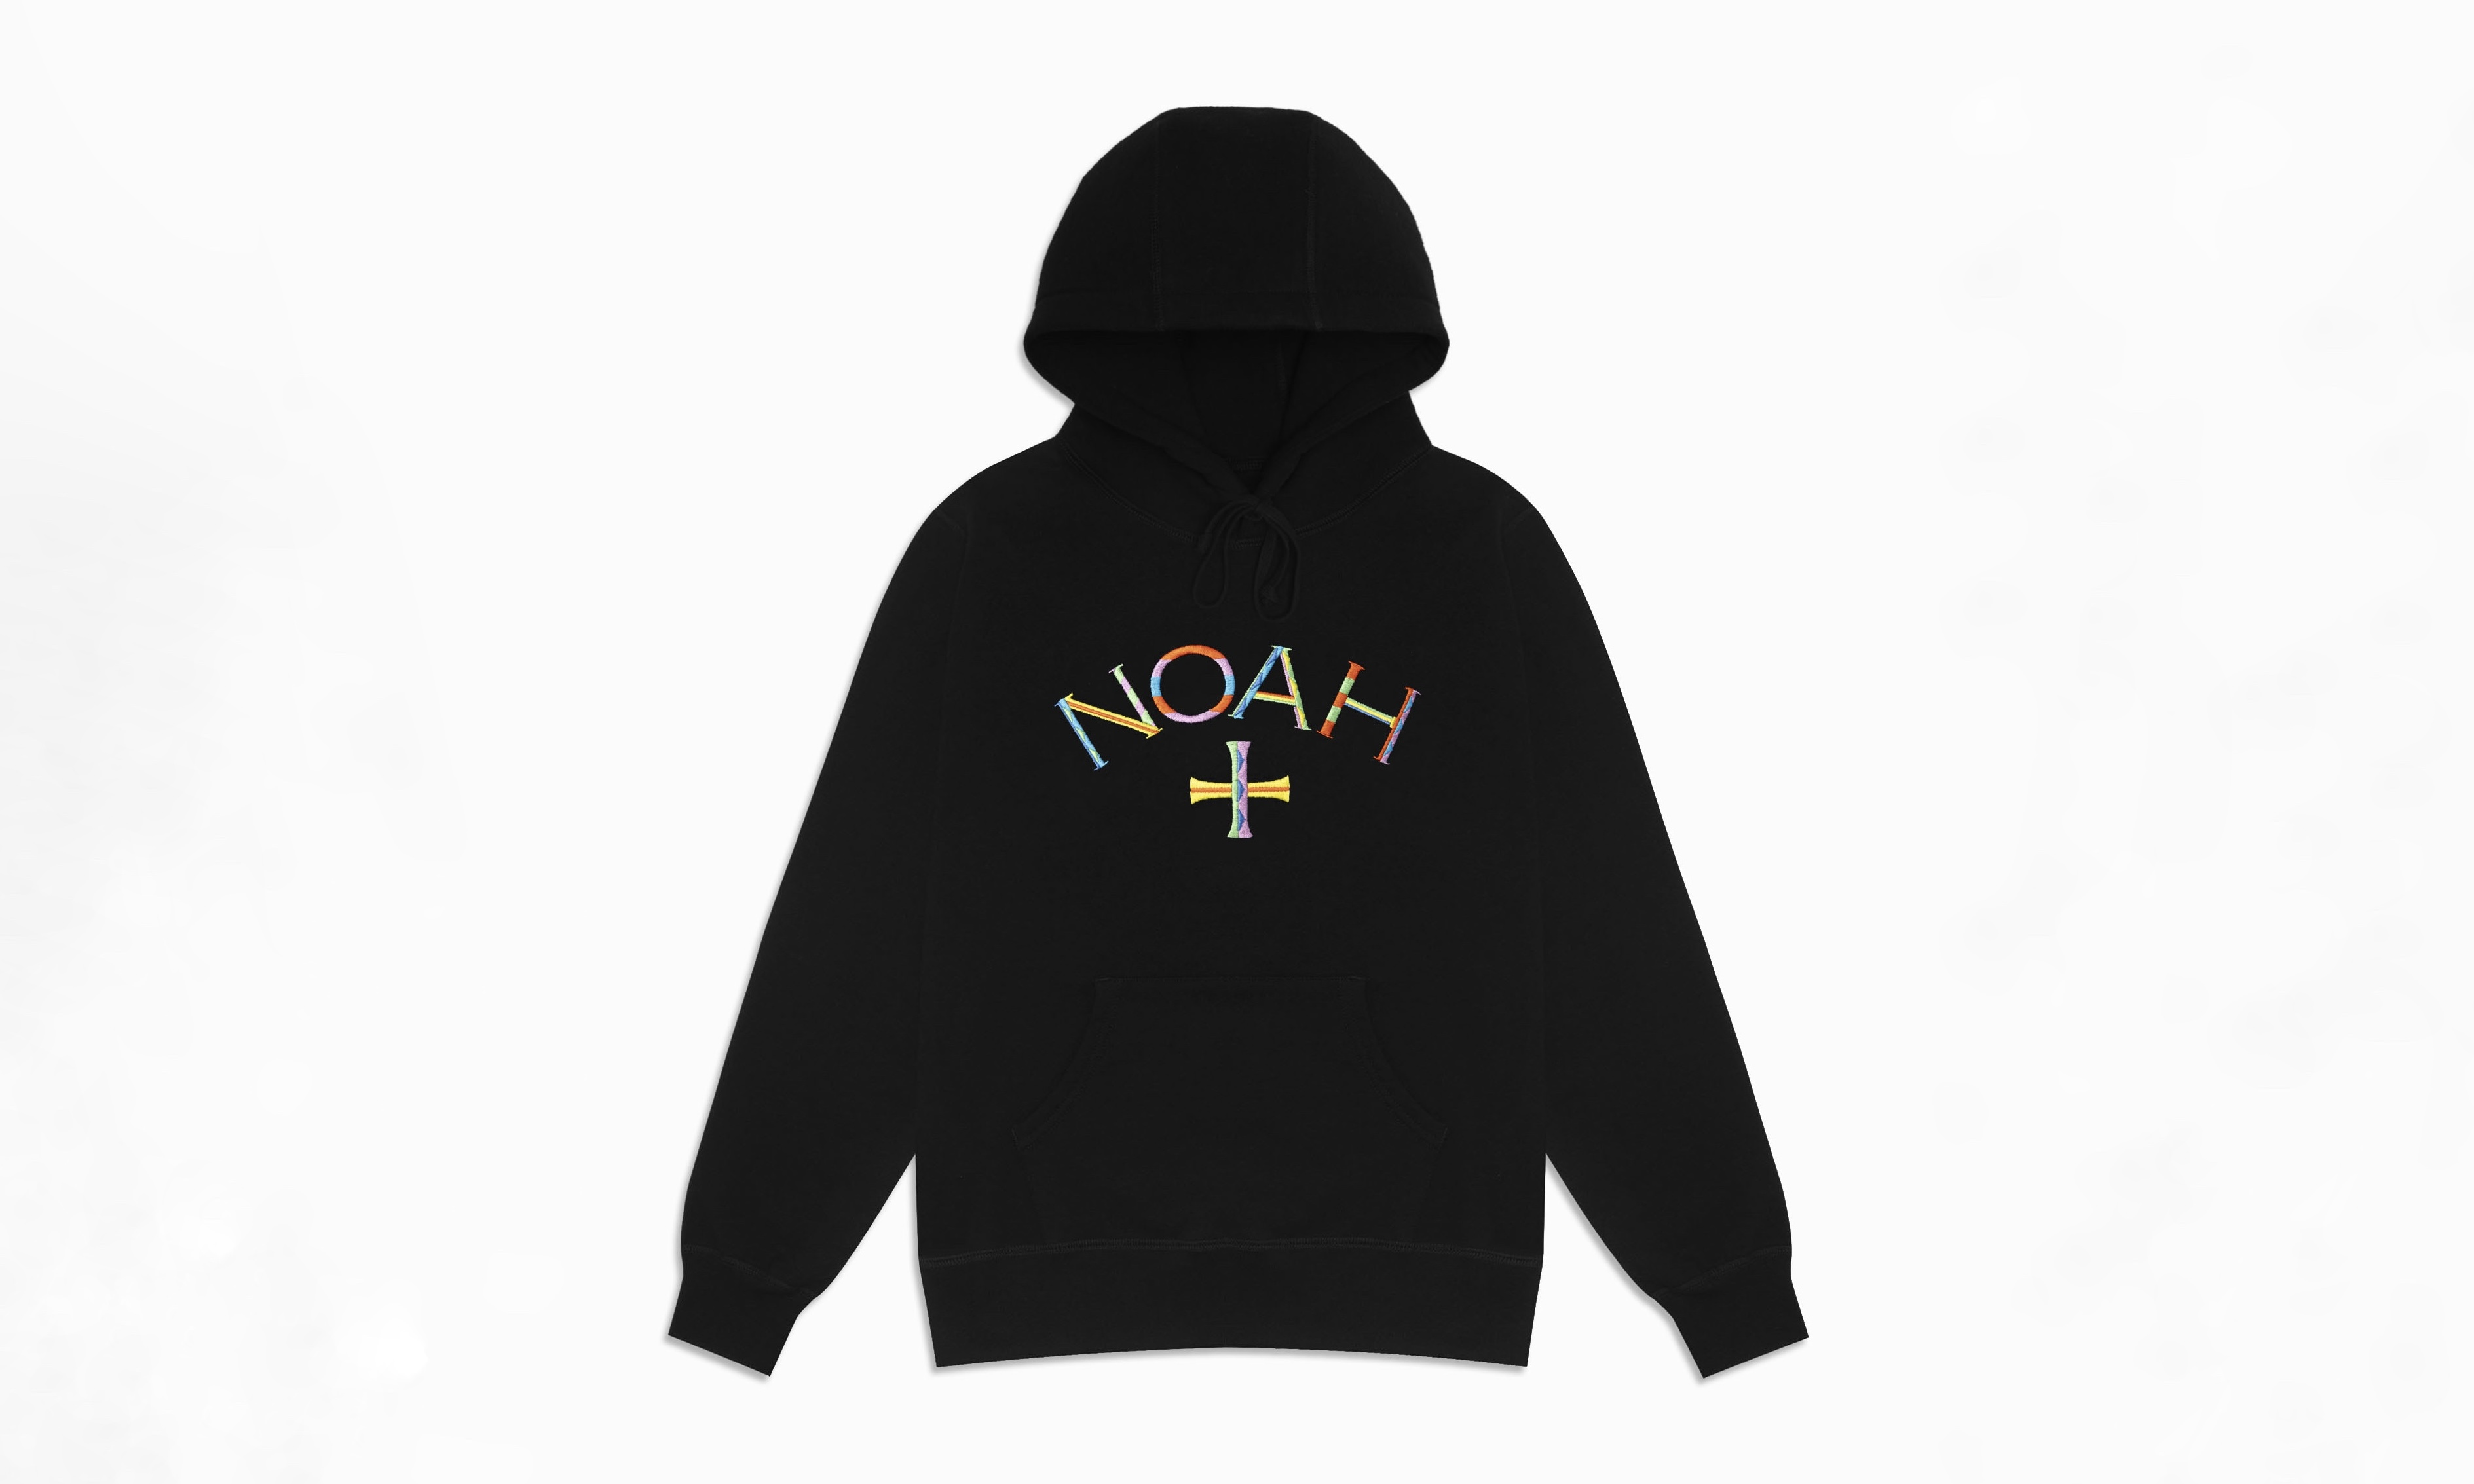 NOAH 刺繍ロゴのコレクション発売